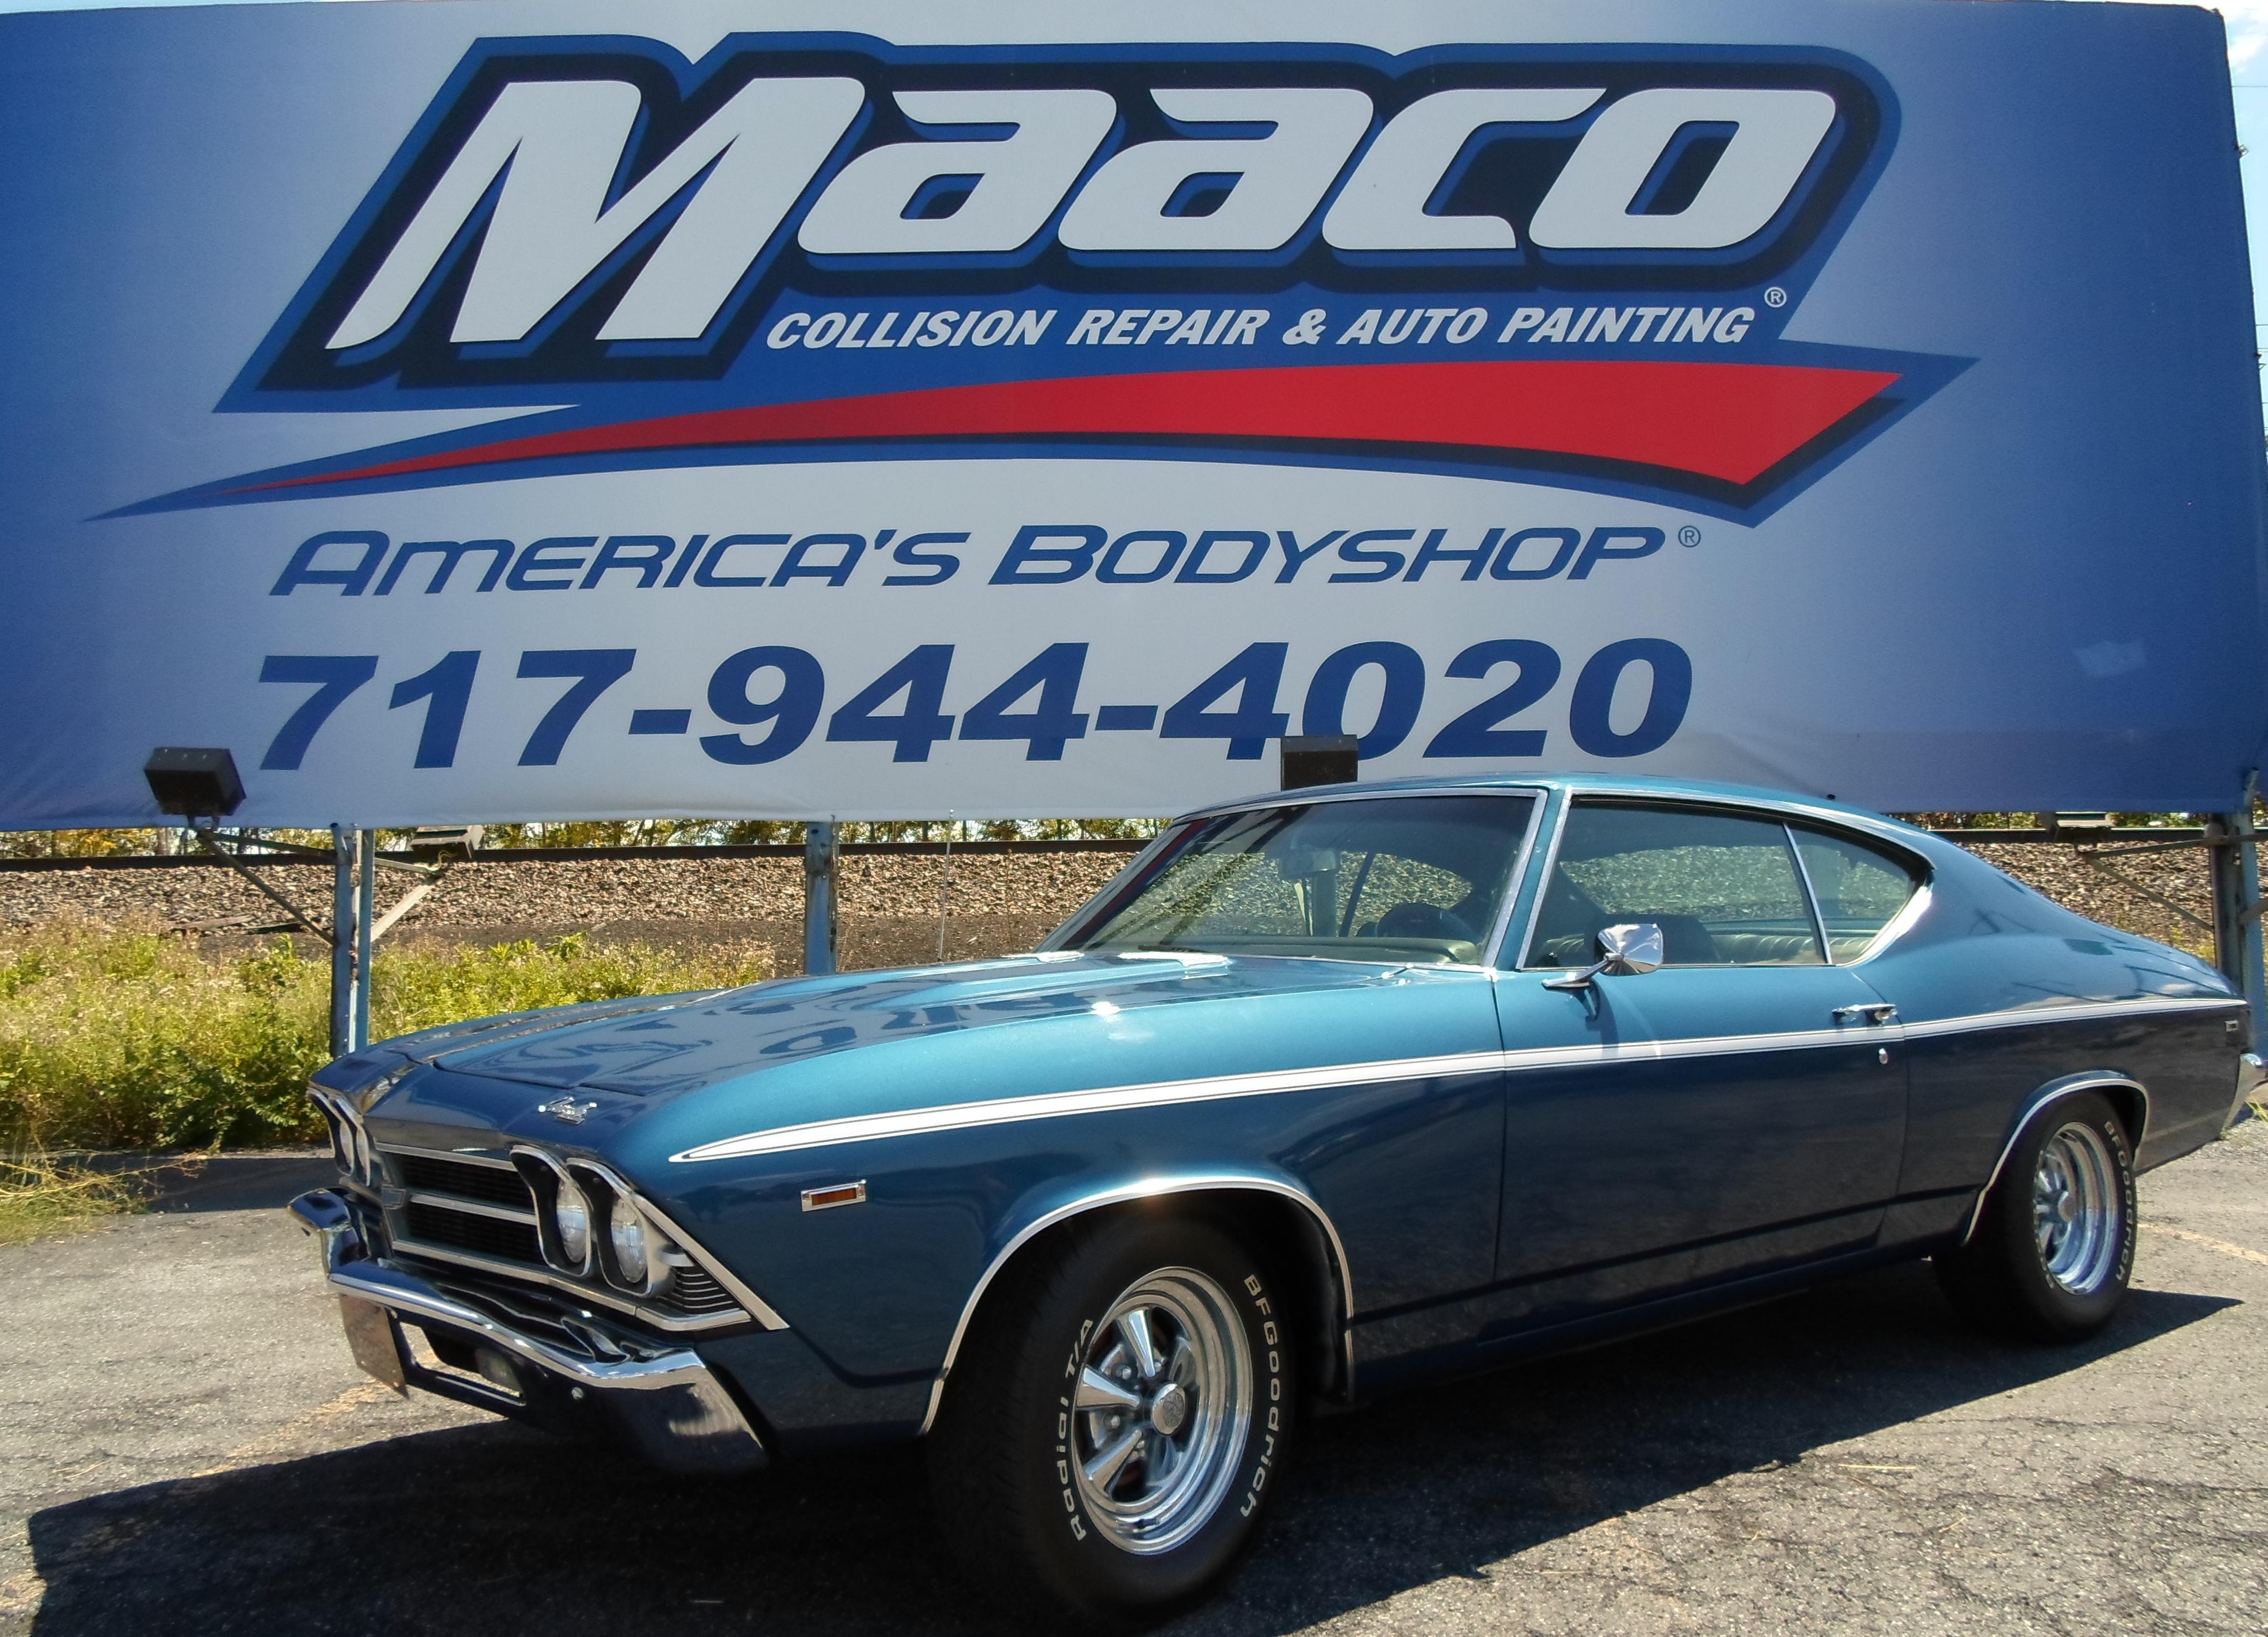 Maaco Collision Repair & Auto Painting image 16